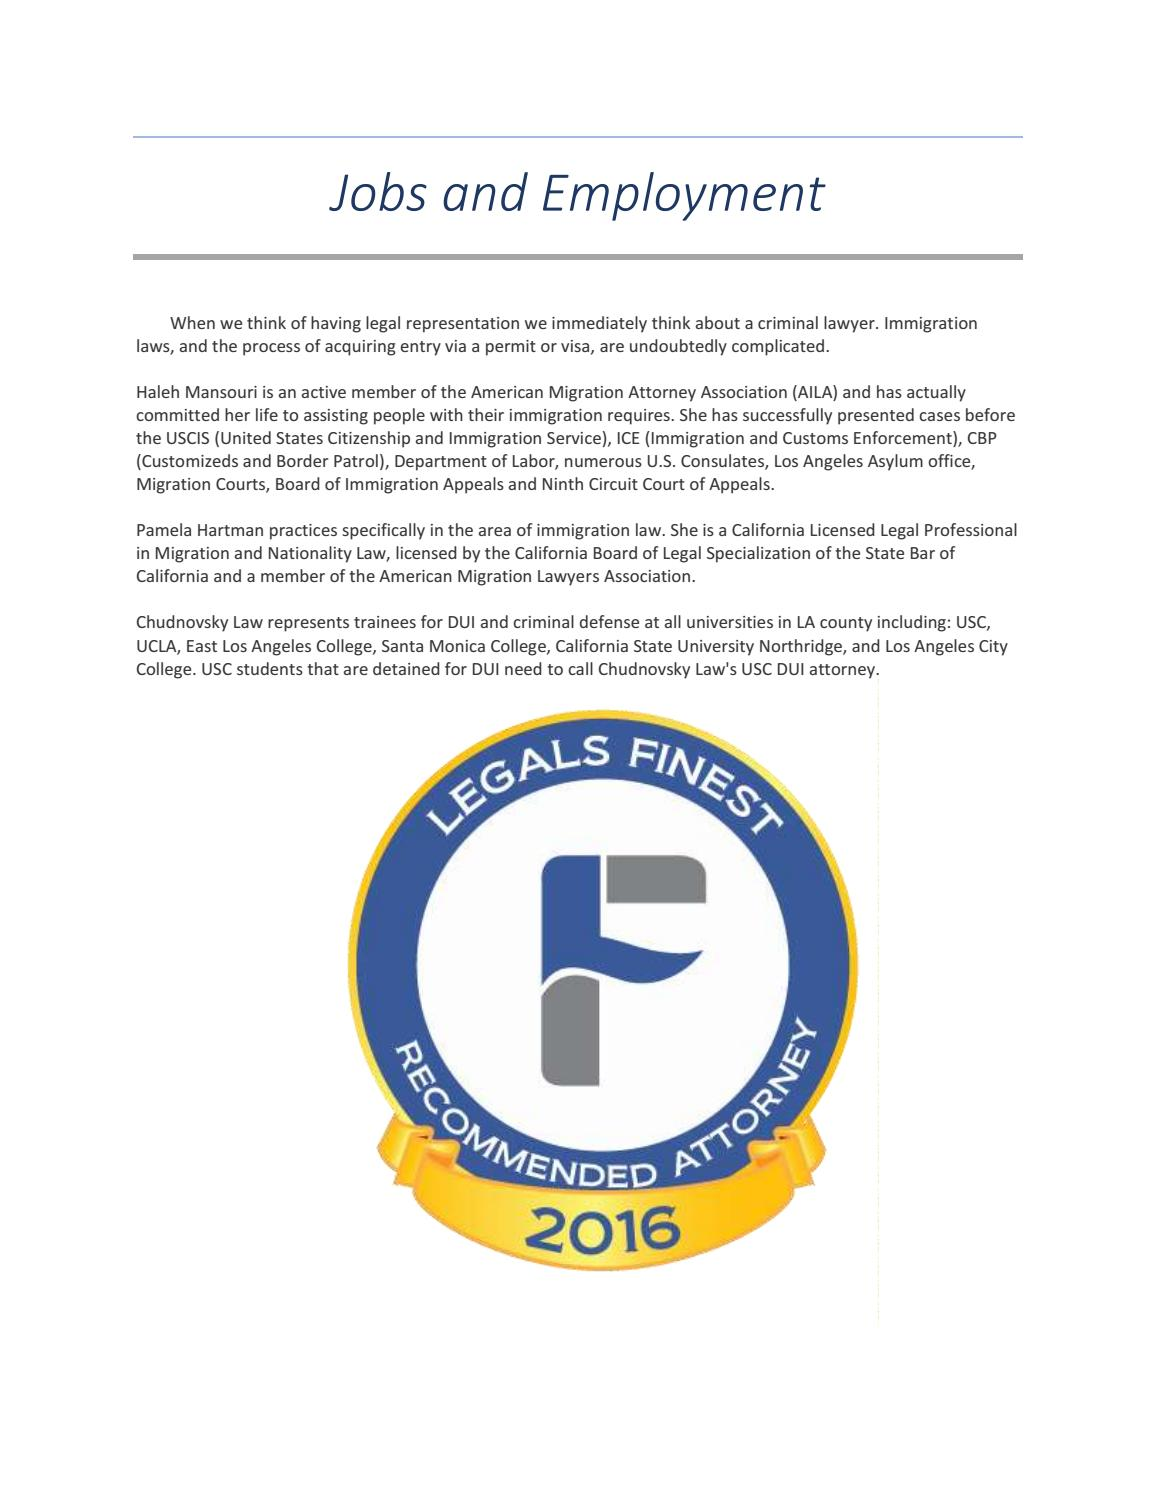 Jobs and Employment by sabrina salazar - issuu